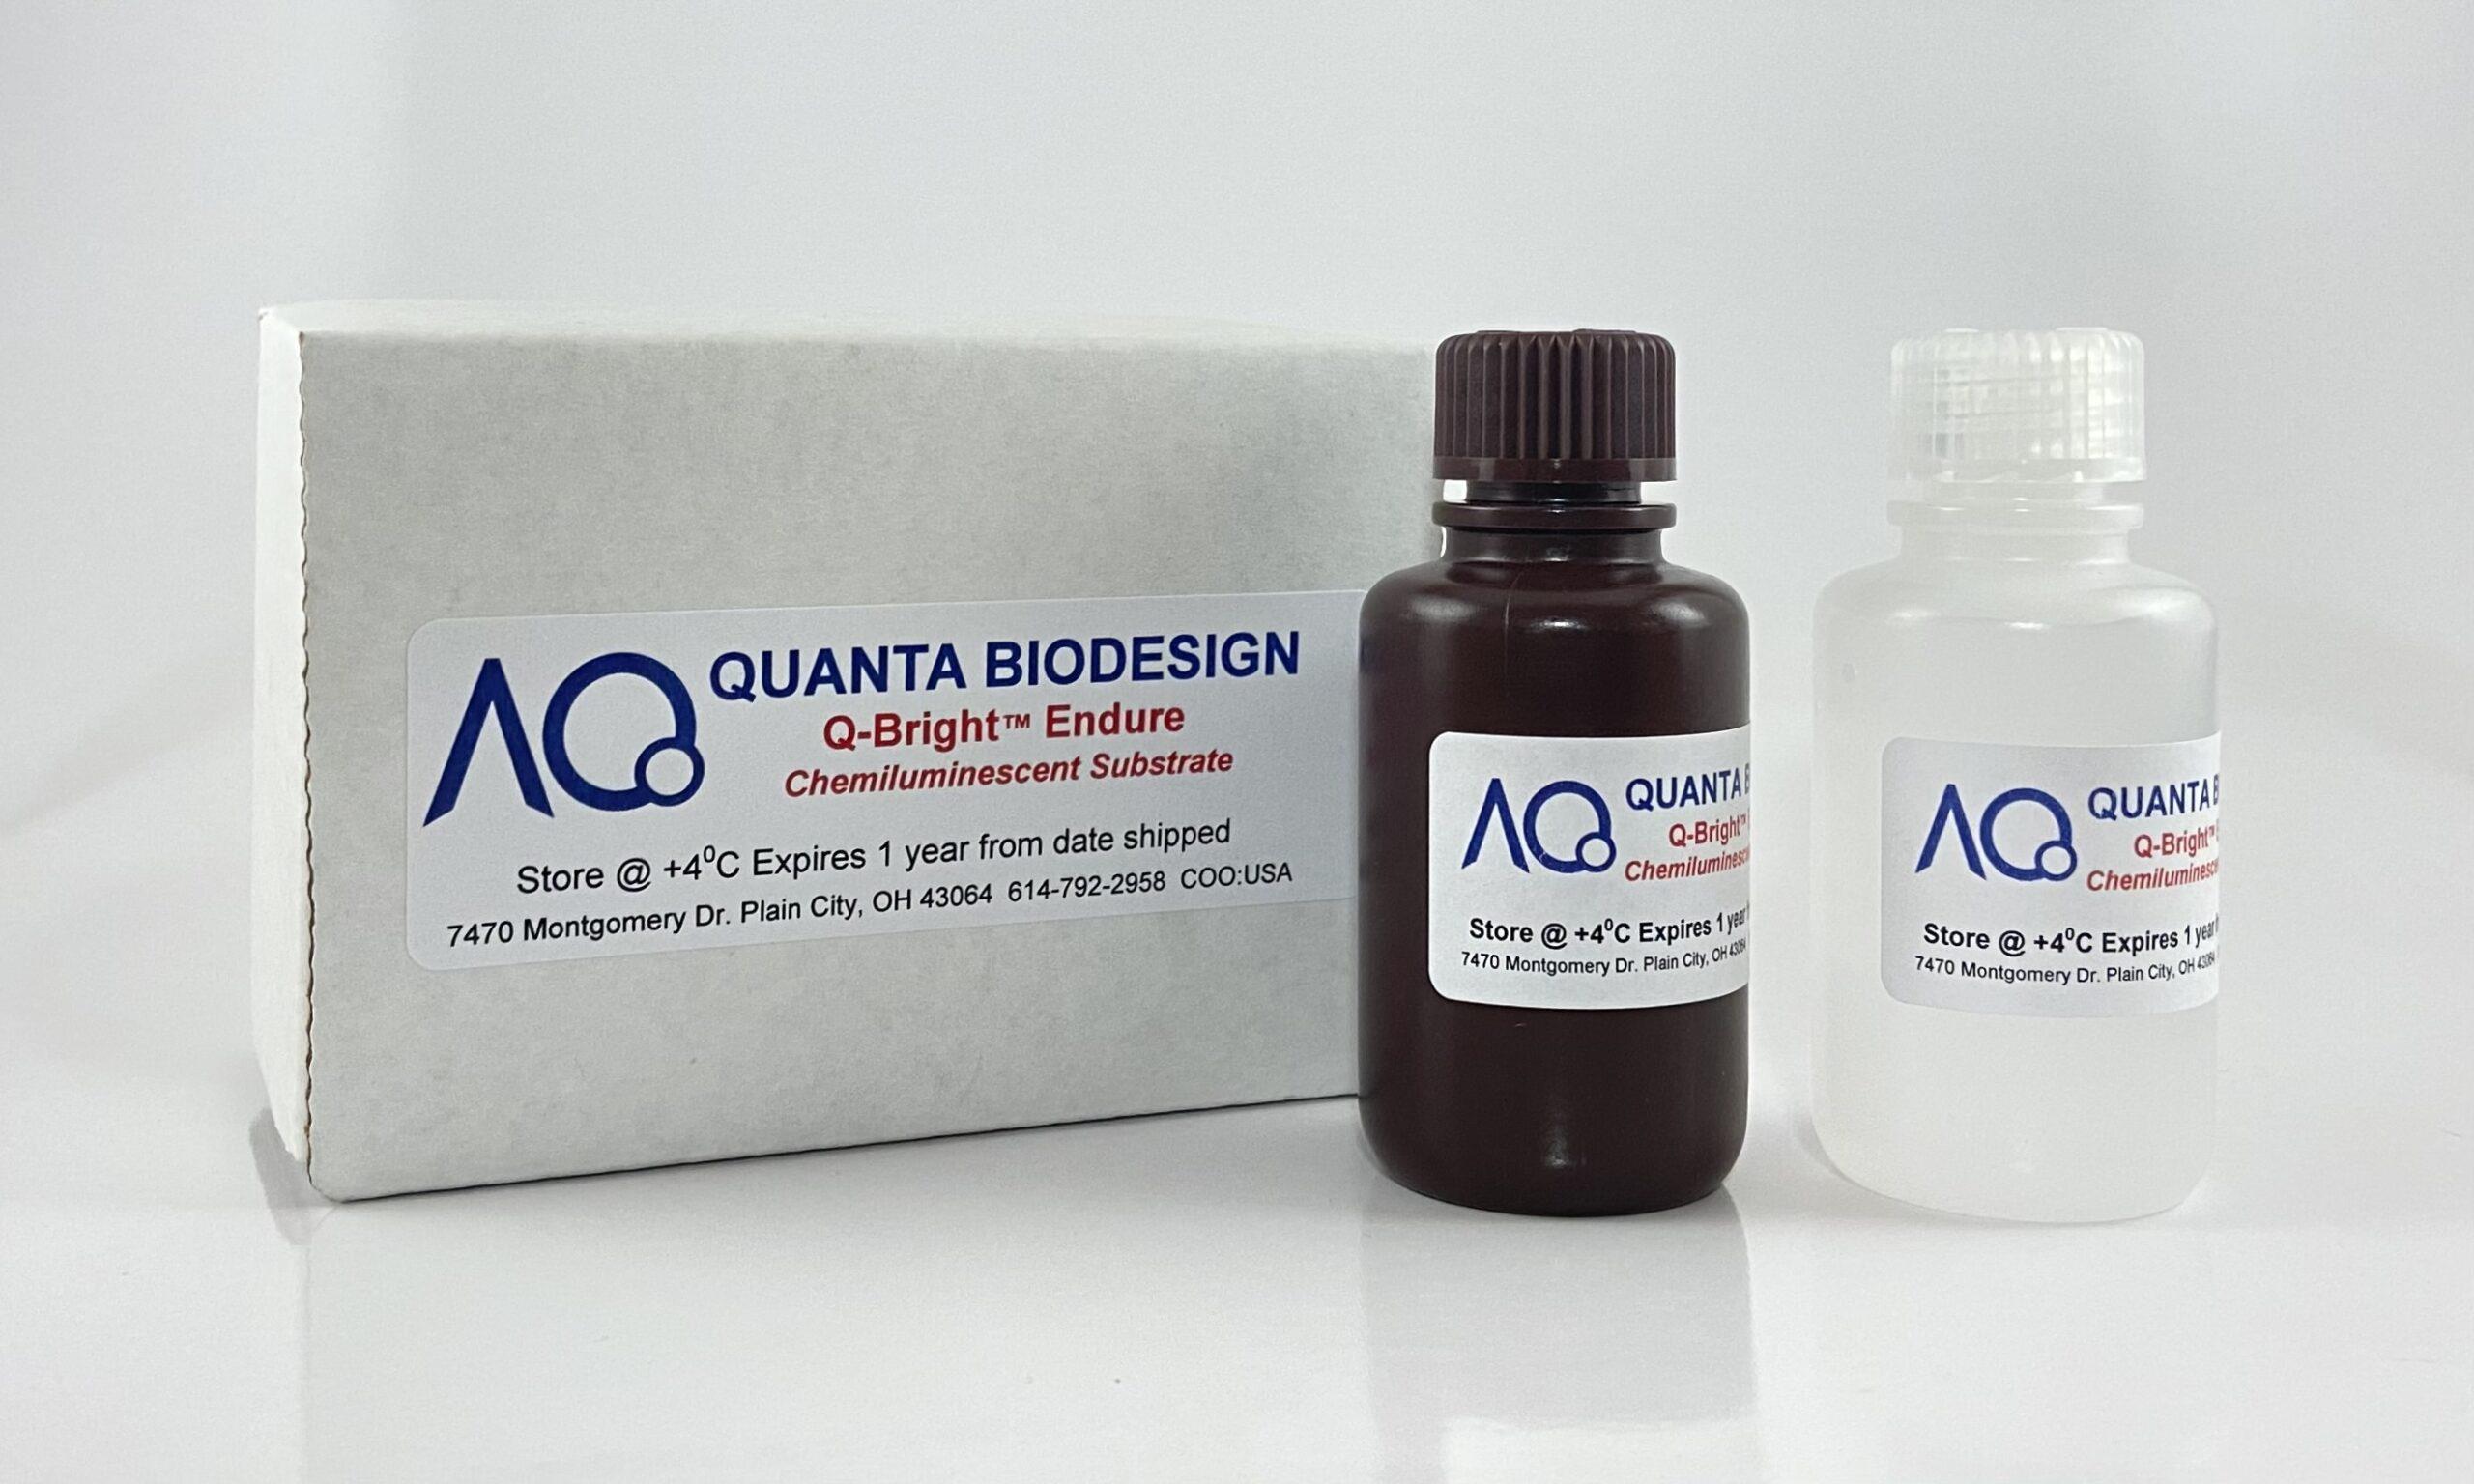 Q-Bright® Endure Chemiluminescent Detection Kit